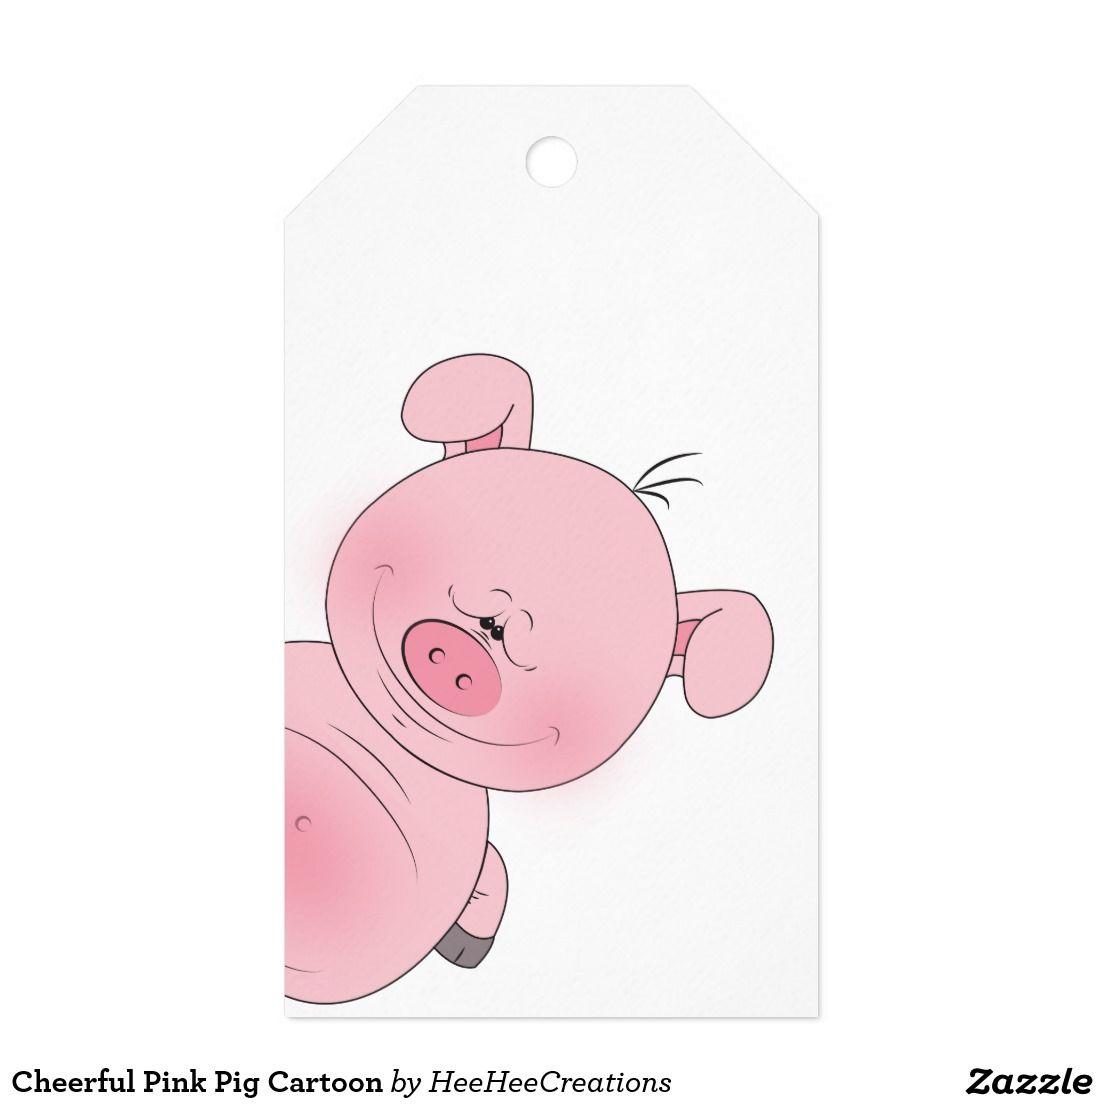 Cheerful Pink Pig Cartoon Gift Tags   Zazzle.com   Cartoon ...